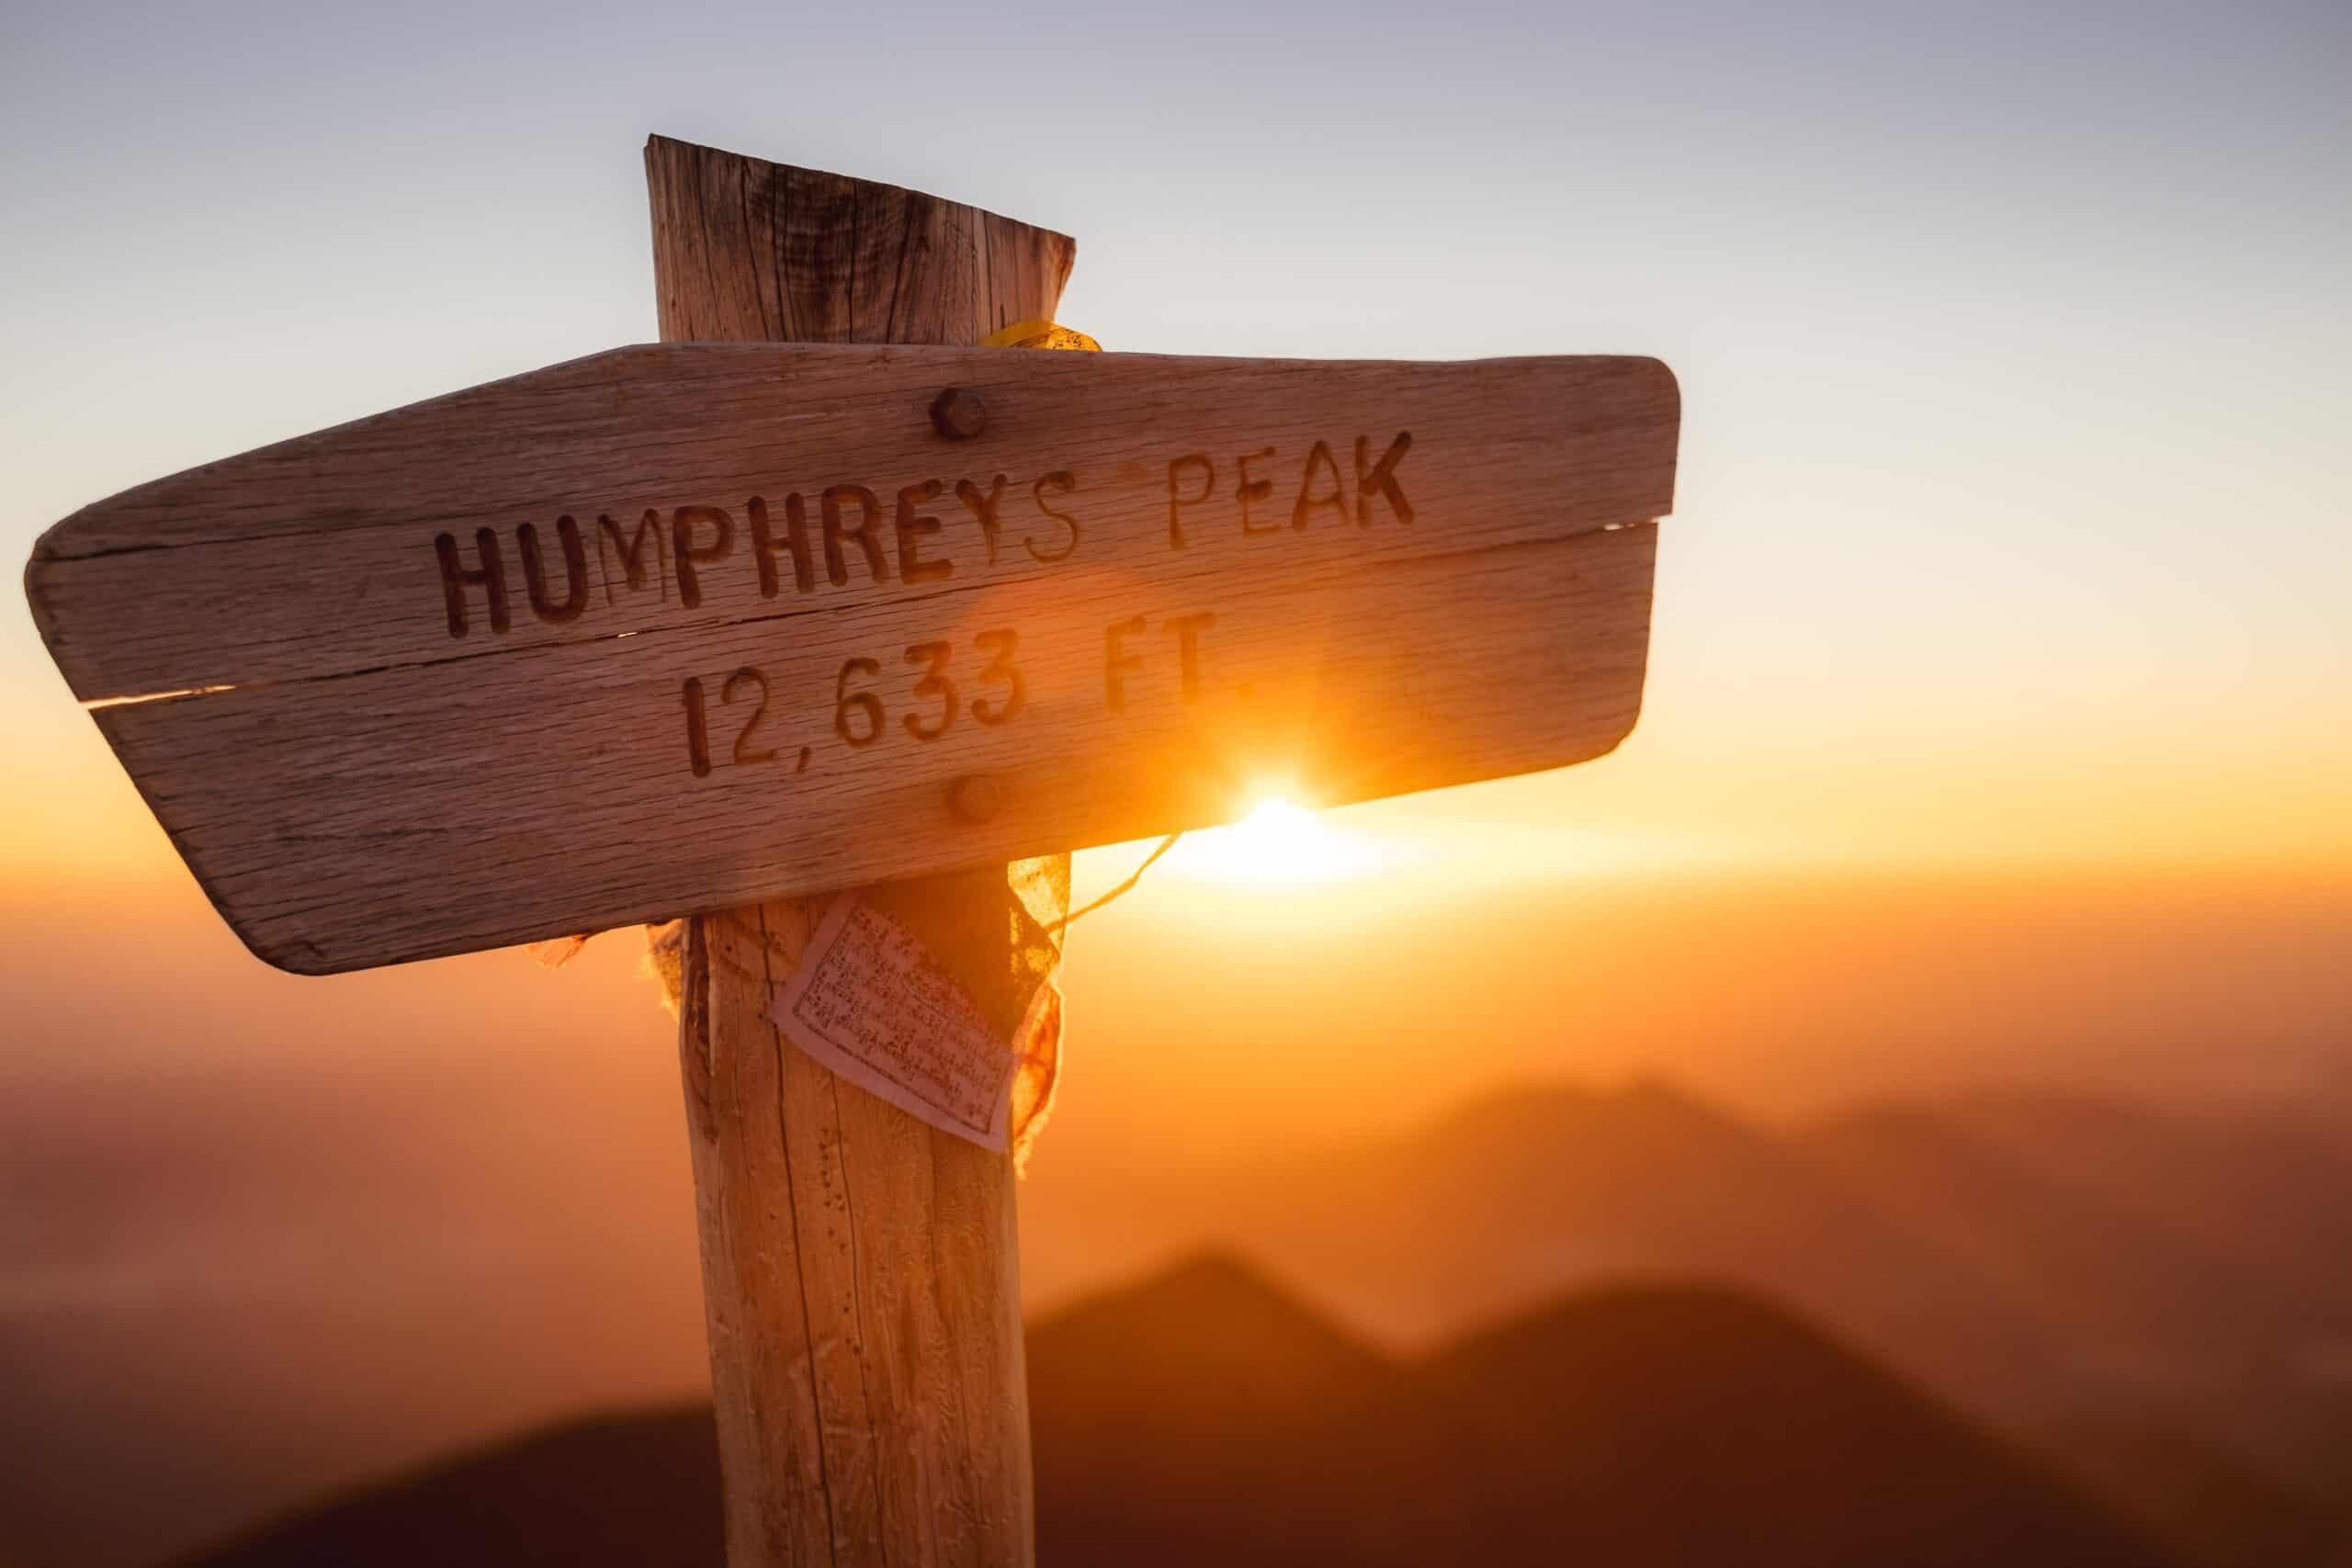 Humphreys peak hiking sunset sign